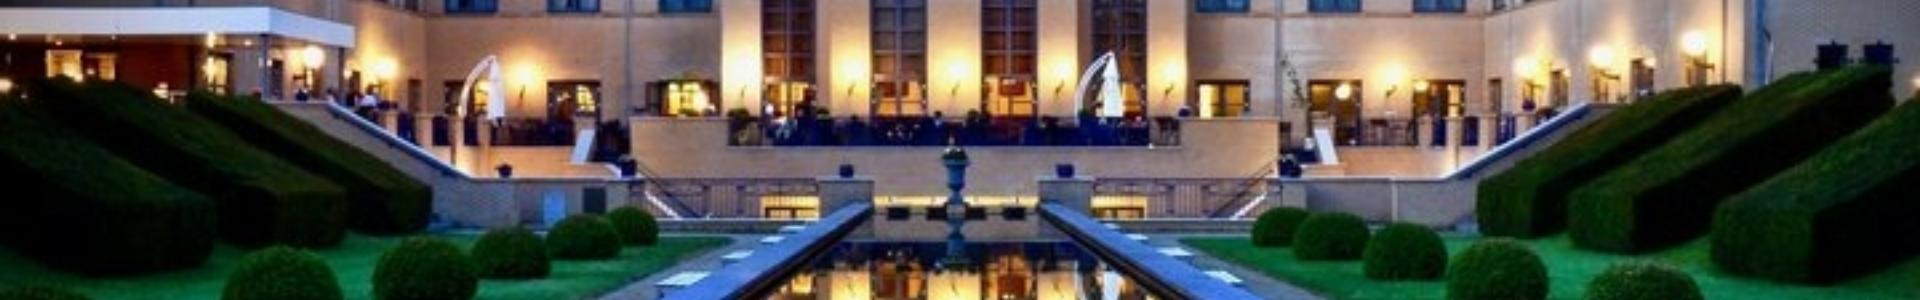 Jaarcongres Vereniging BWT Nederland